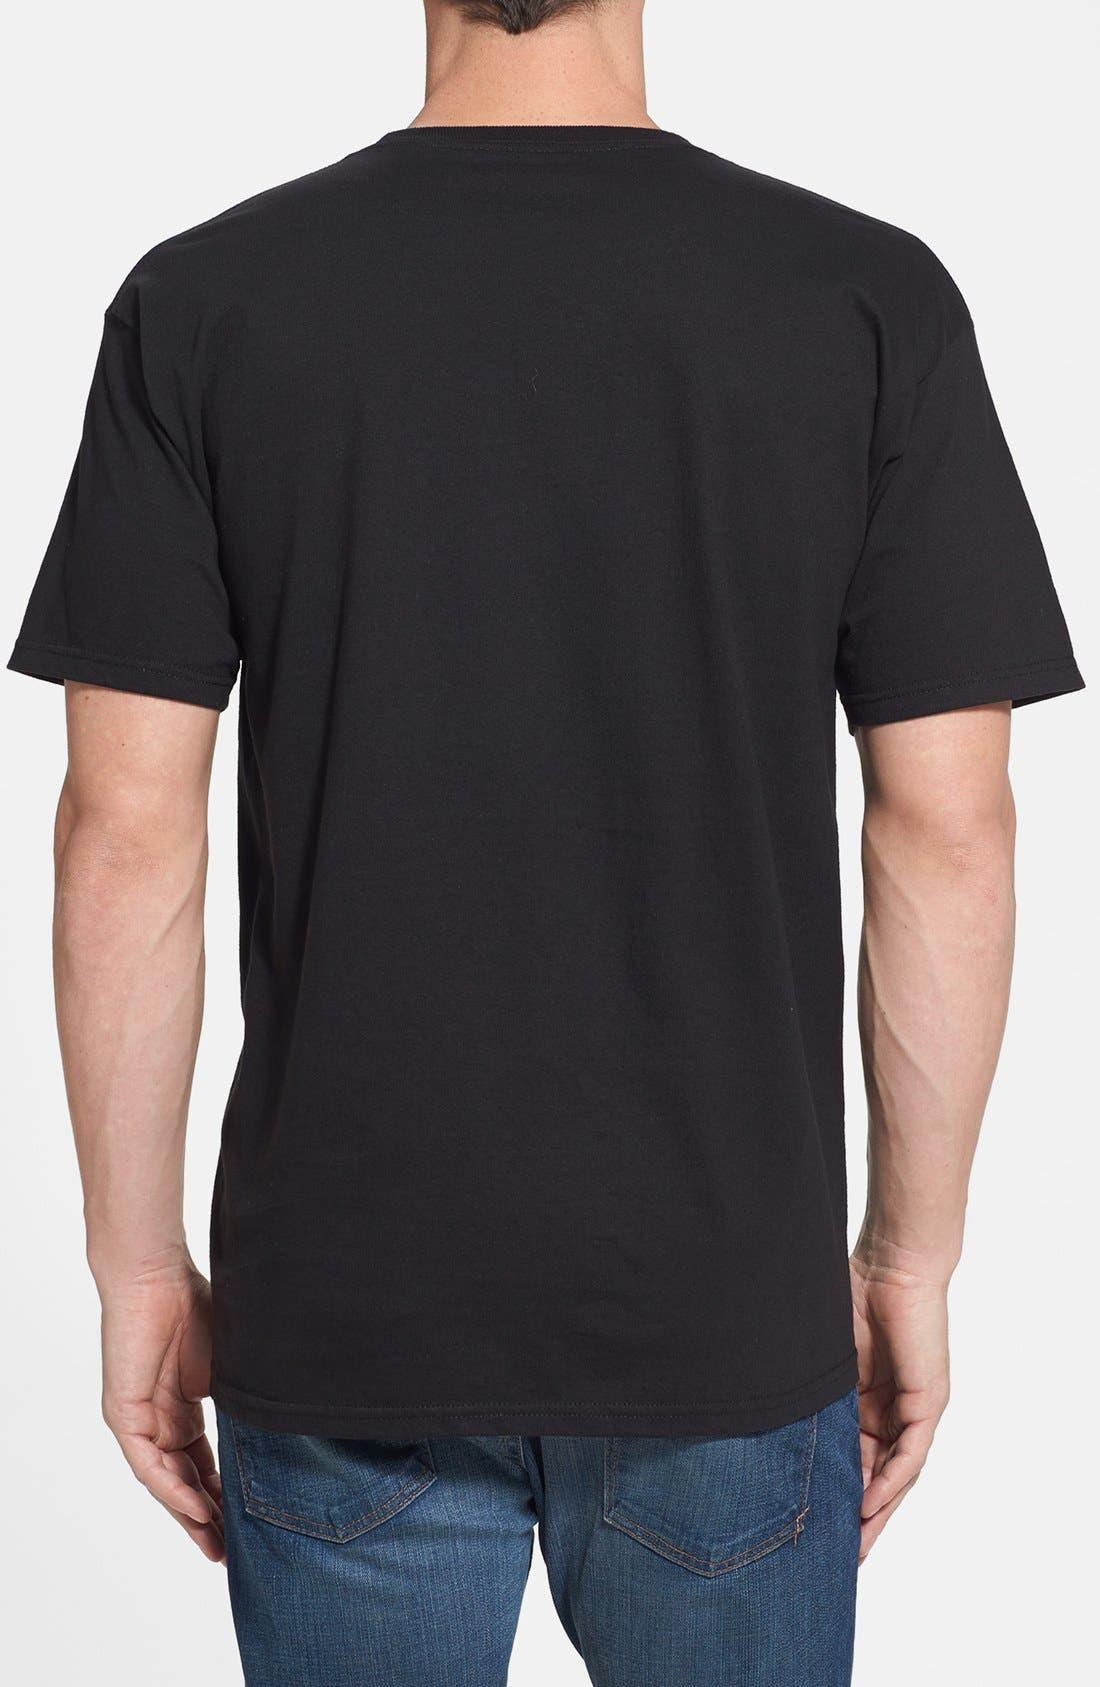 Alternate Image 2  - Jack O'Neill 'Marriage' Crewneck T-Shirt